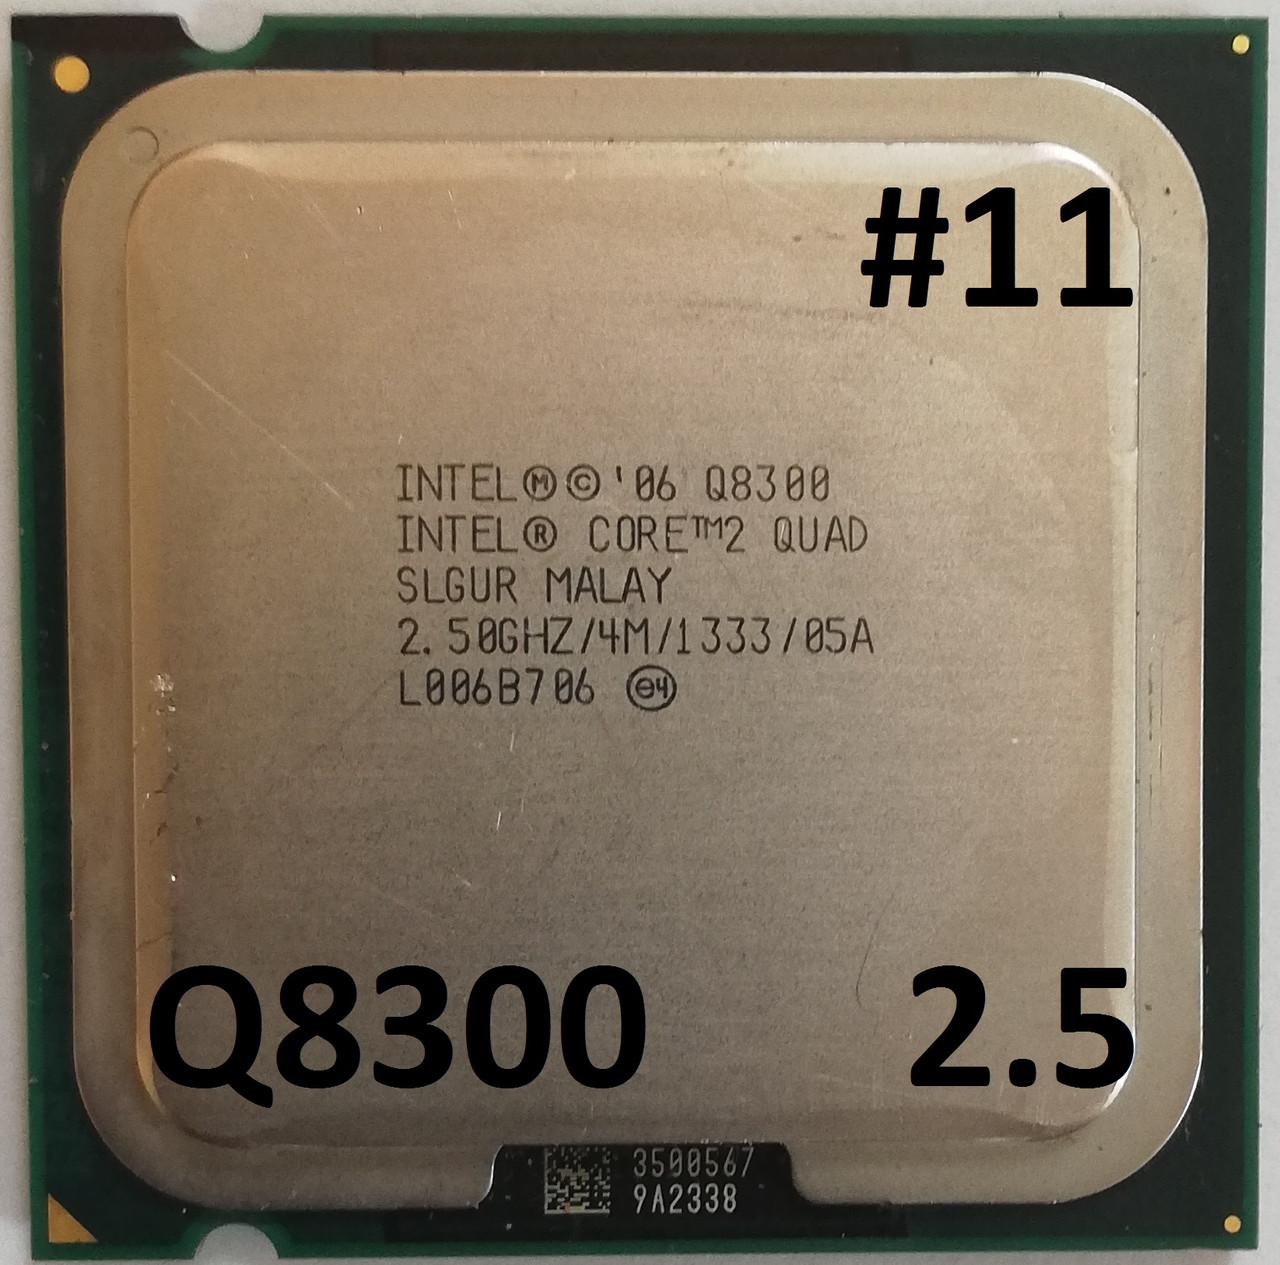 Процессор ЛОТ#11 Intel® Core™2 Quad Q8300 SLGUR 2.5GHz 4M Cache 1333 MHz FSB Socket 775 Б/У